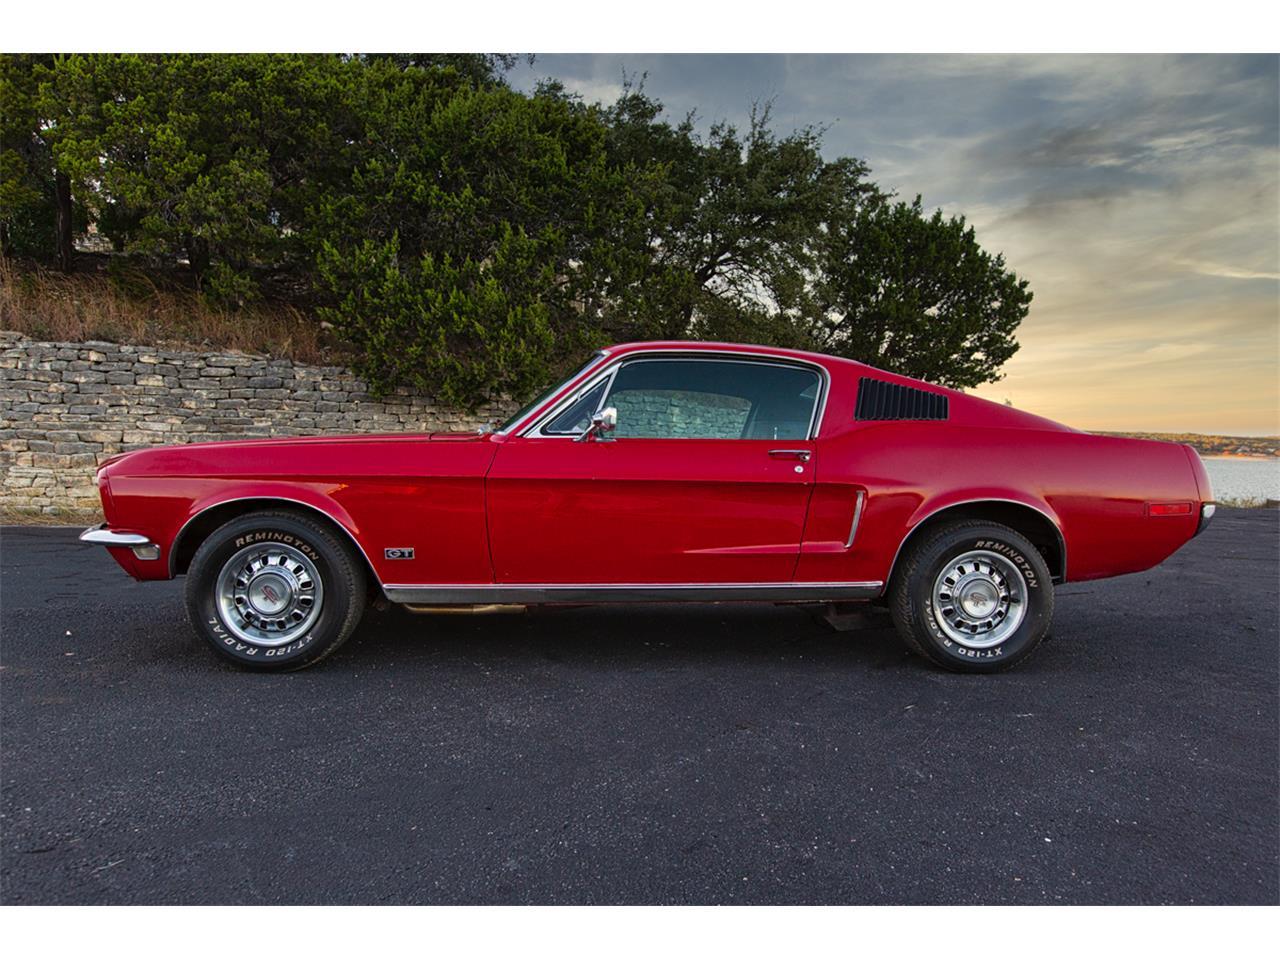 Ford Mustang V8 427 1968 prix tout compris